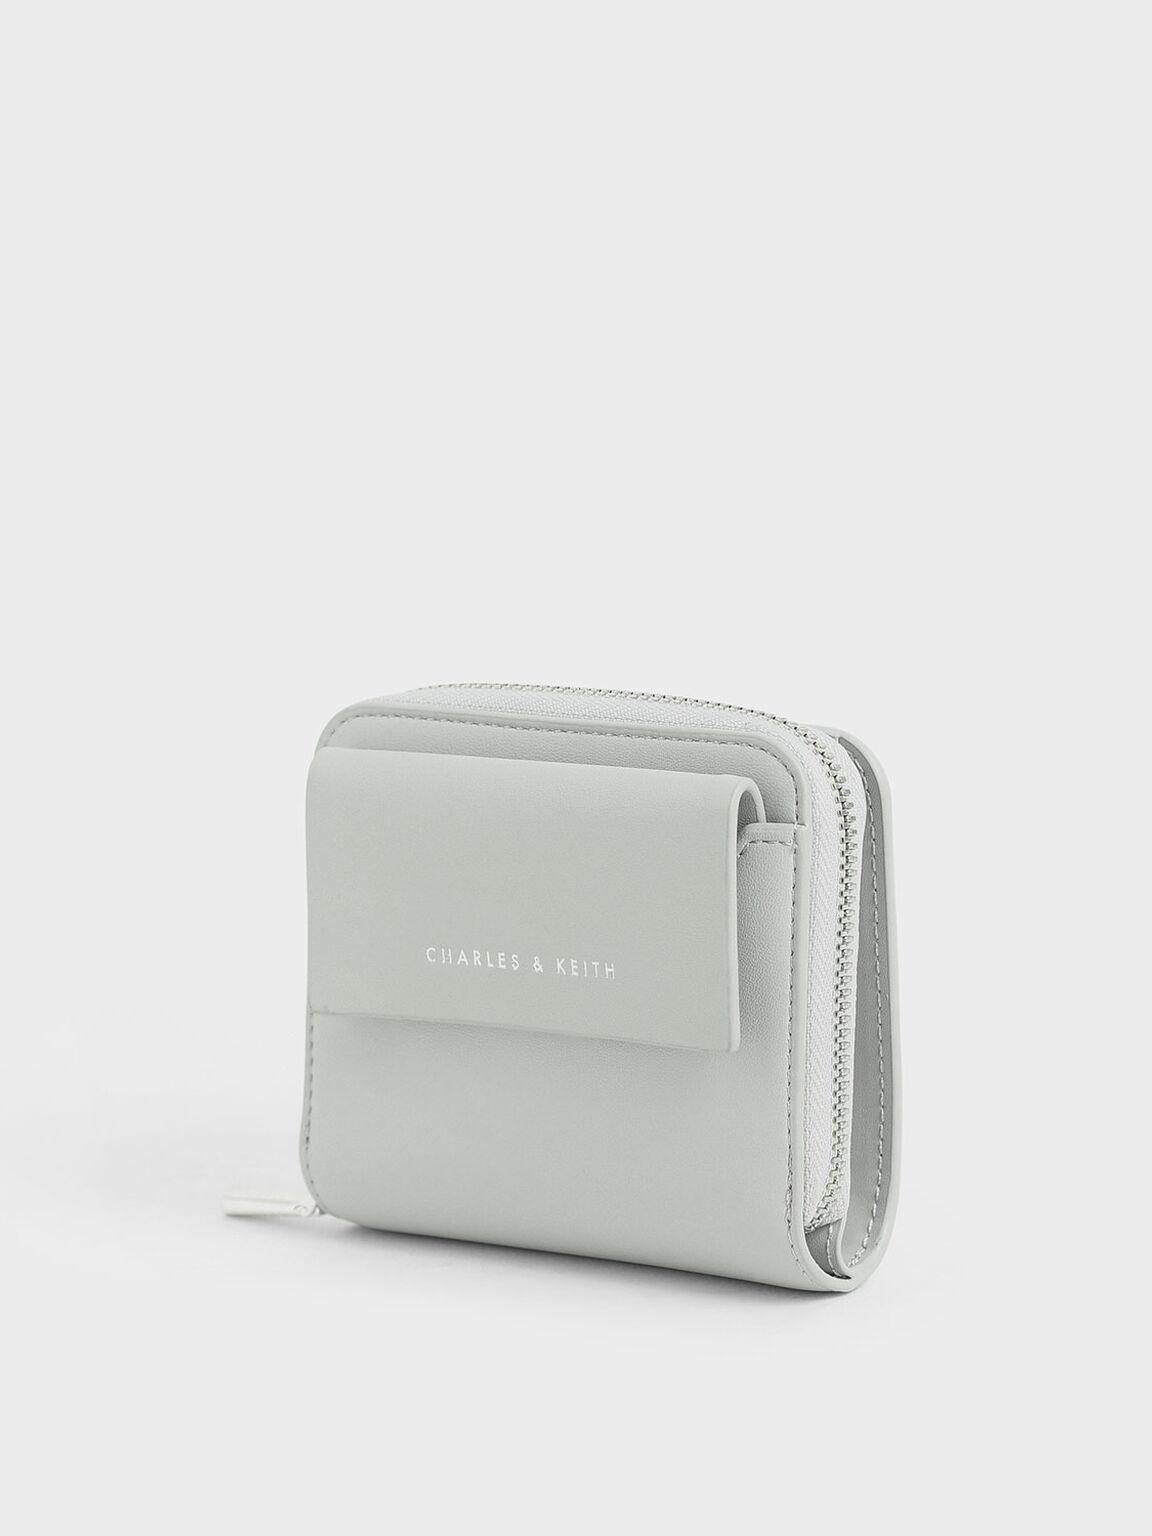 Mini Square Wallet, Dusty Blue, hi-res